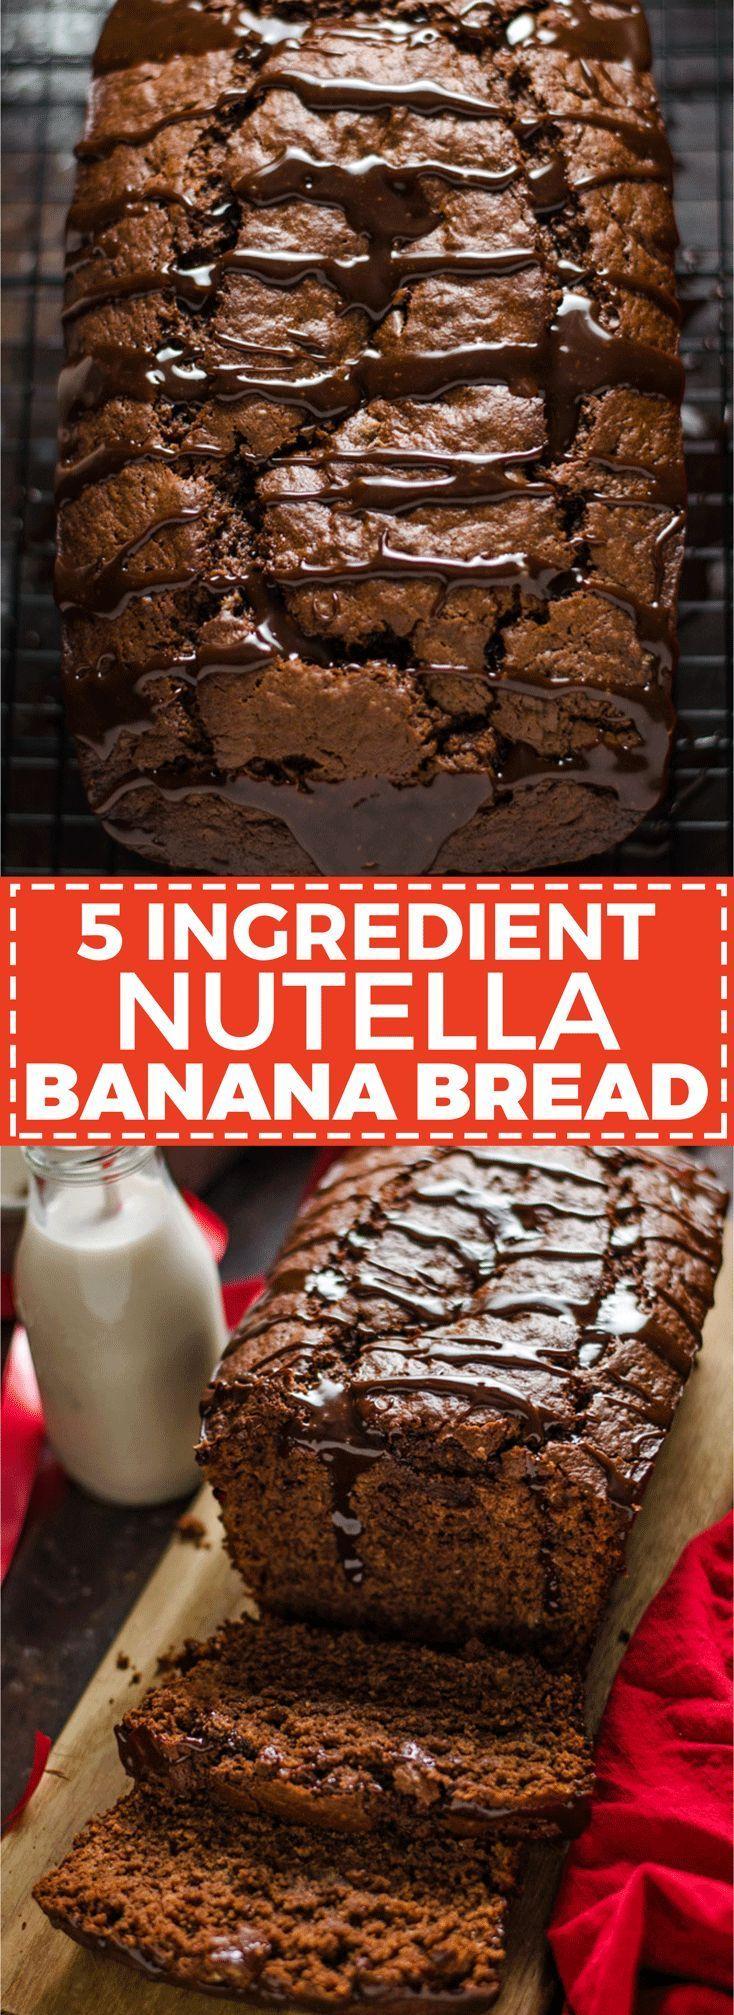 5 ingredient Nutella Banana Bread  Host The Toast 5 ingredient Nutella Banana Bread  Host The Toast